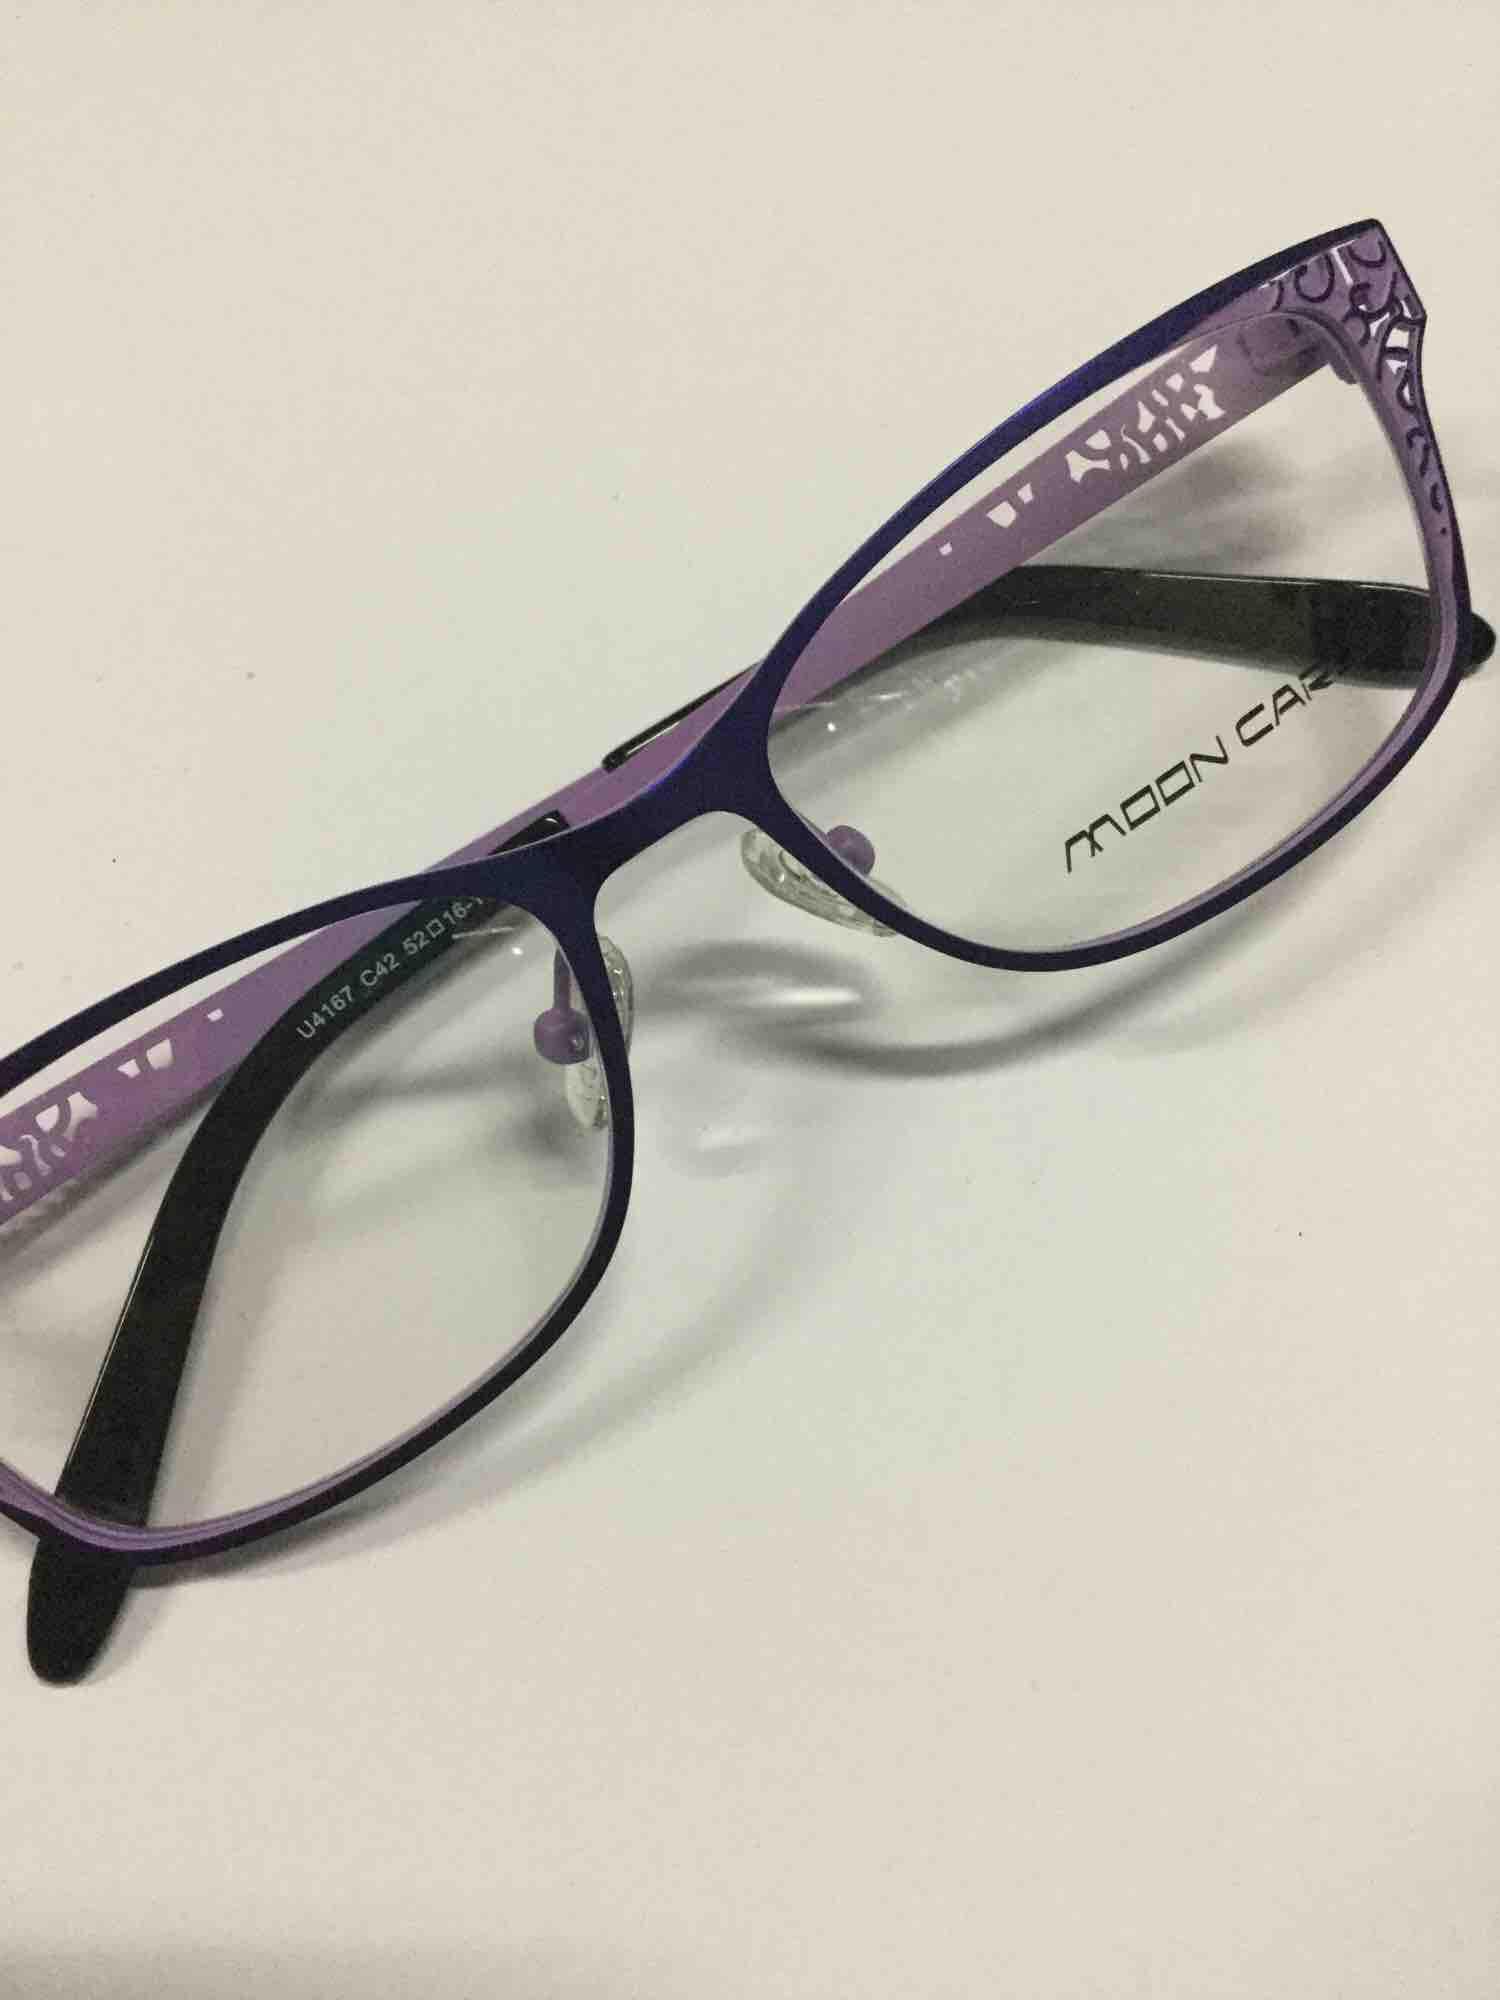 ac9a9b8f8d Prescription Glasses for Women for sale - Womens Prescription ...